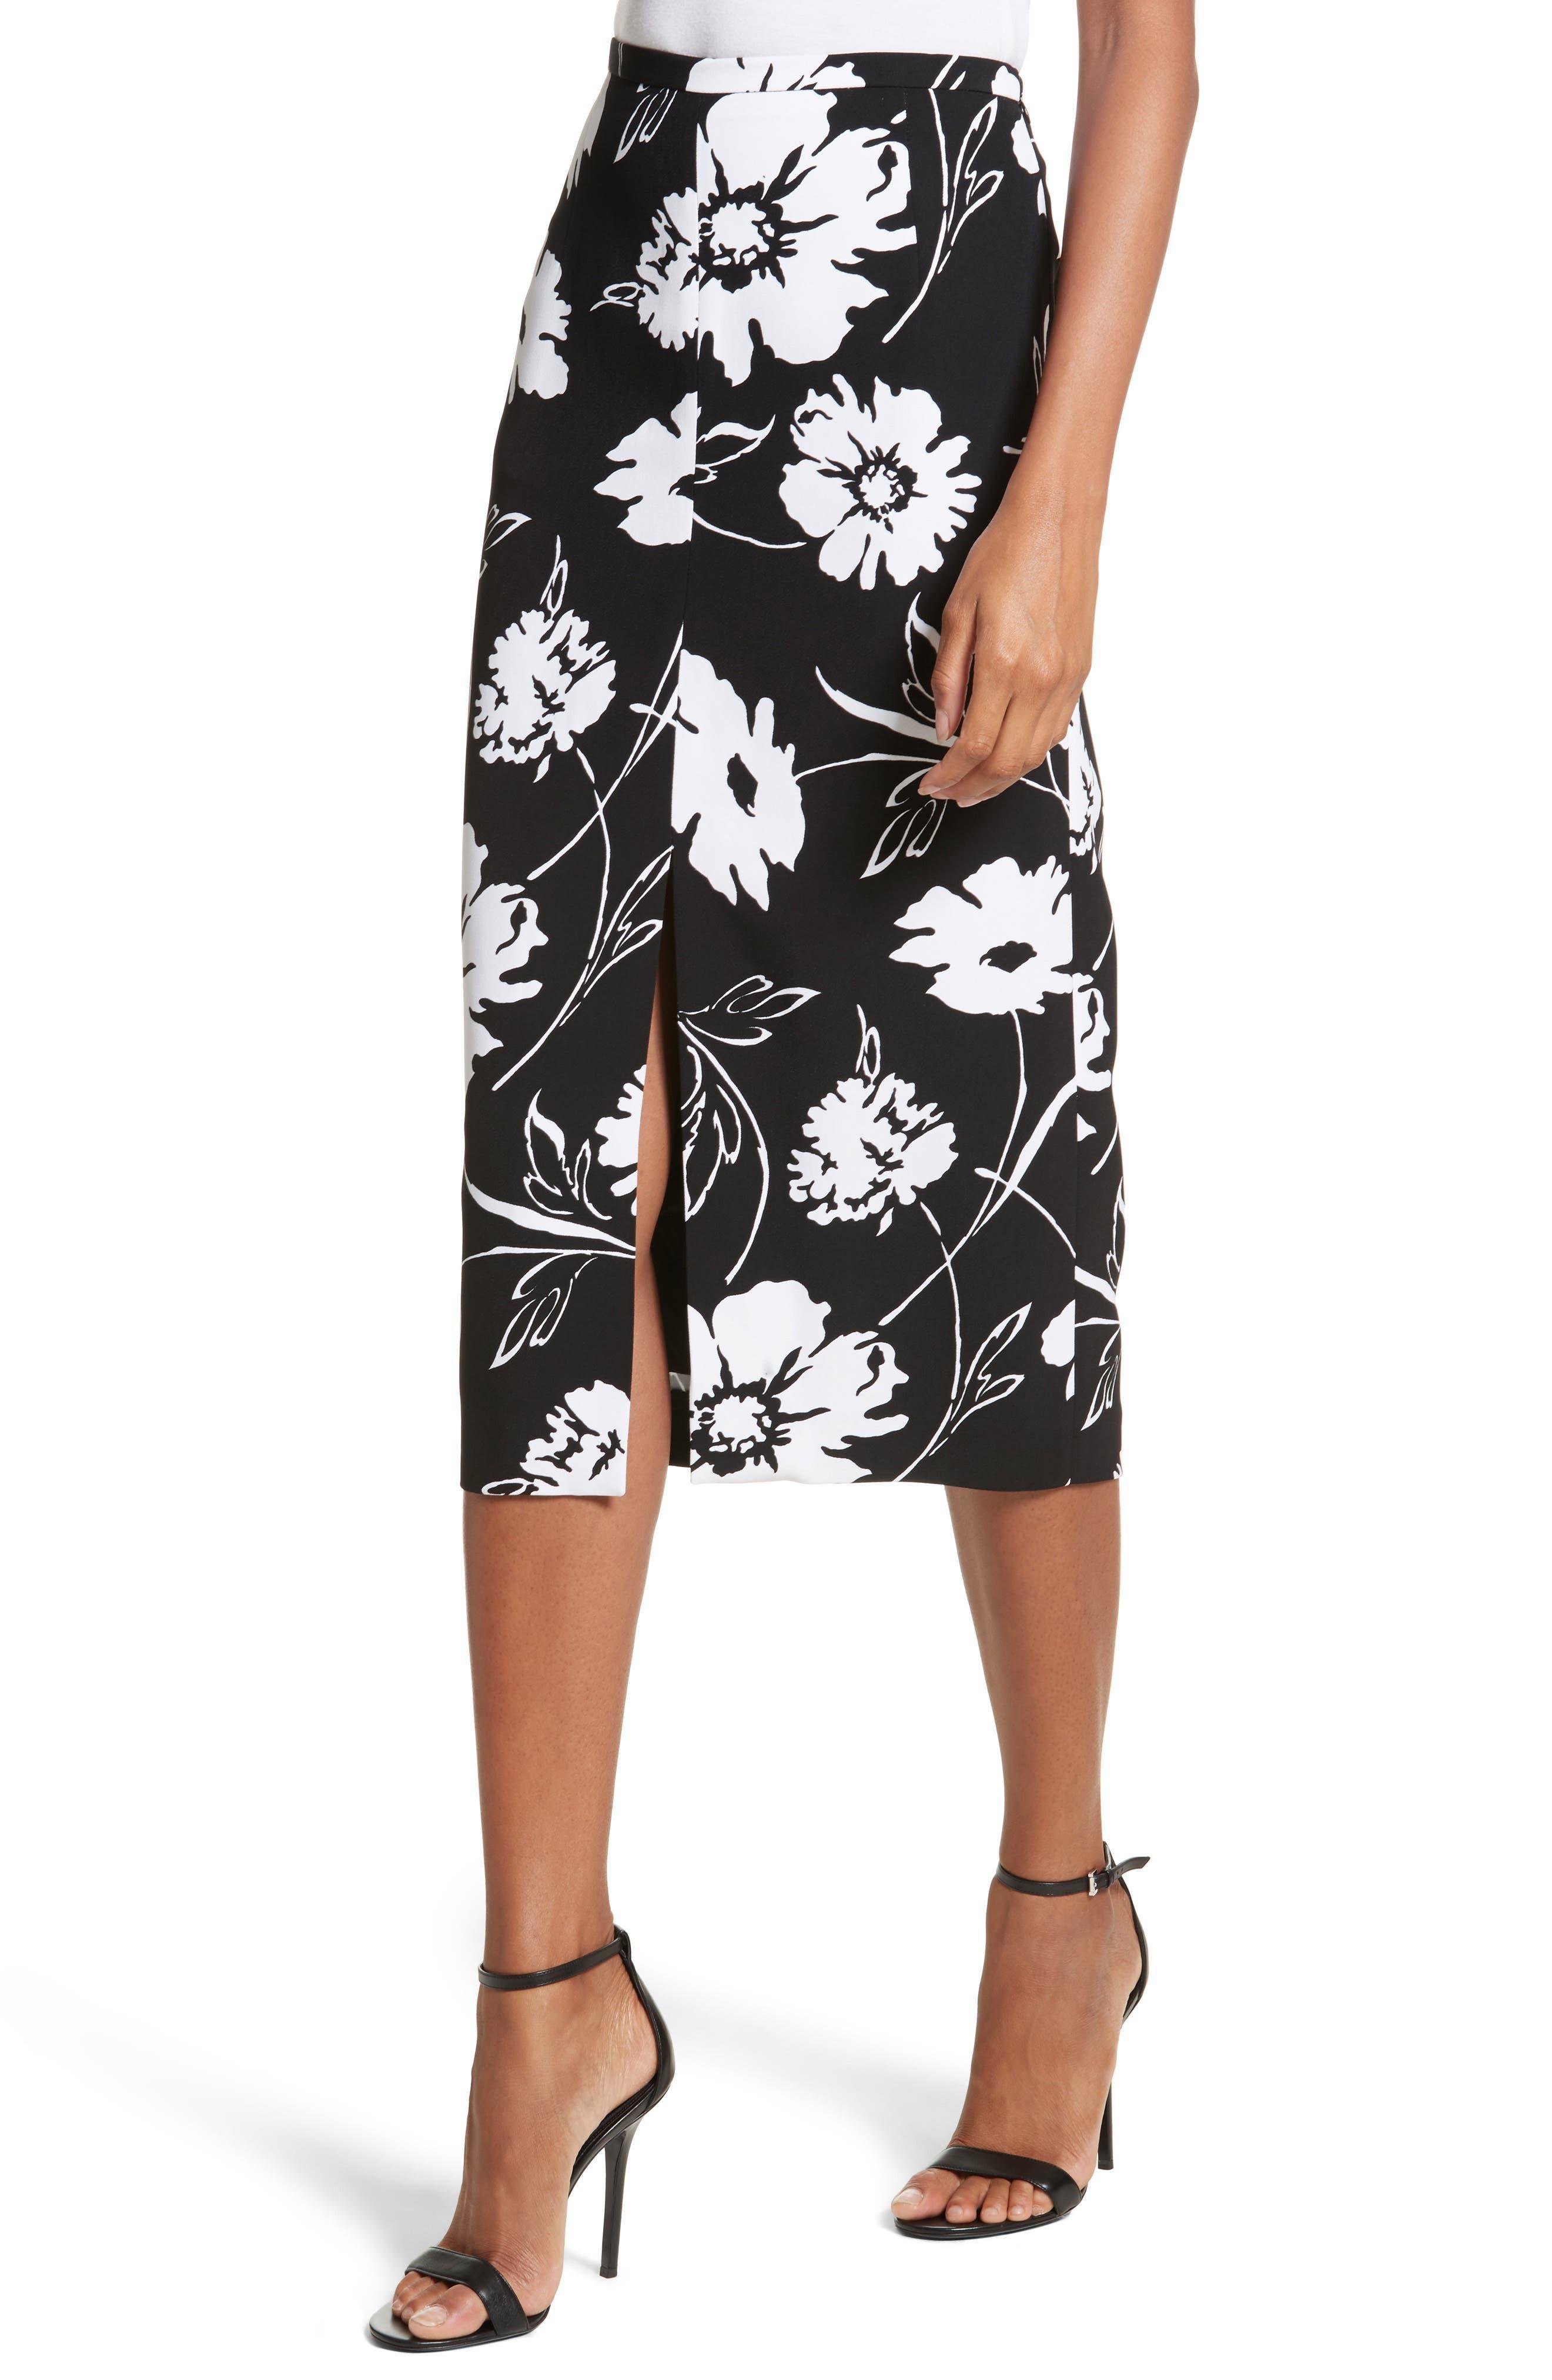 Floral Print Pencil Skirt,                             Alternate thumbnail 4, color,                             Black / White